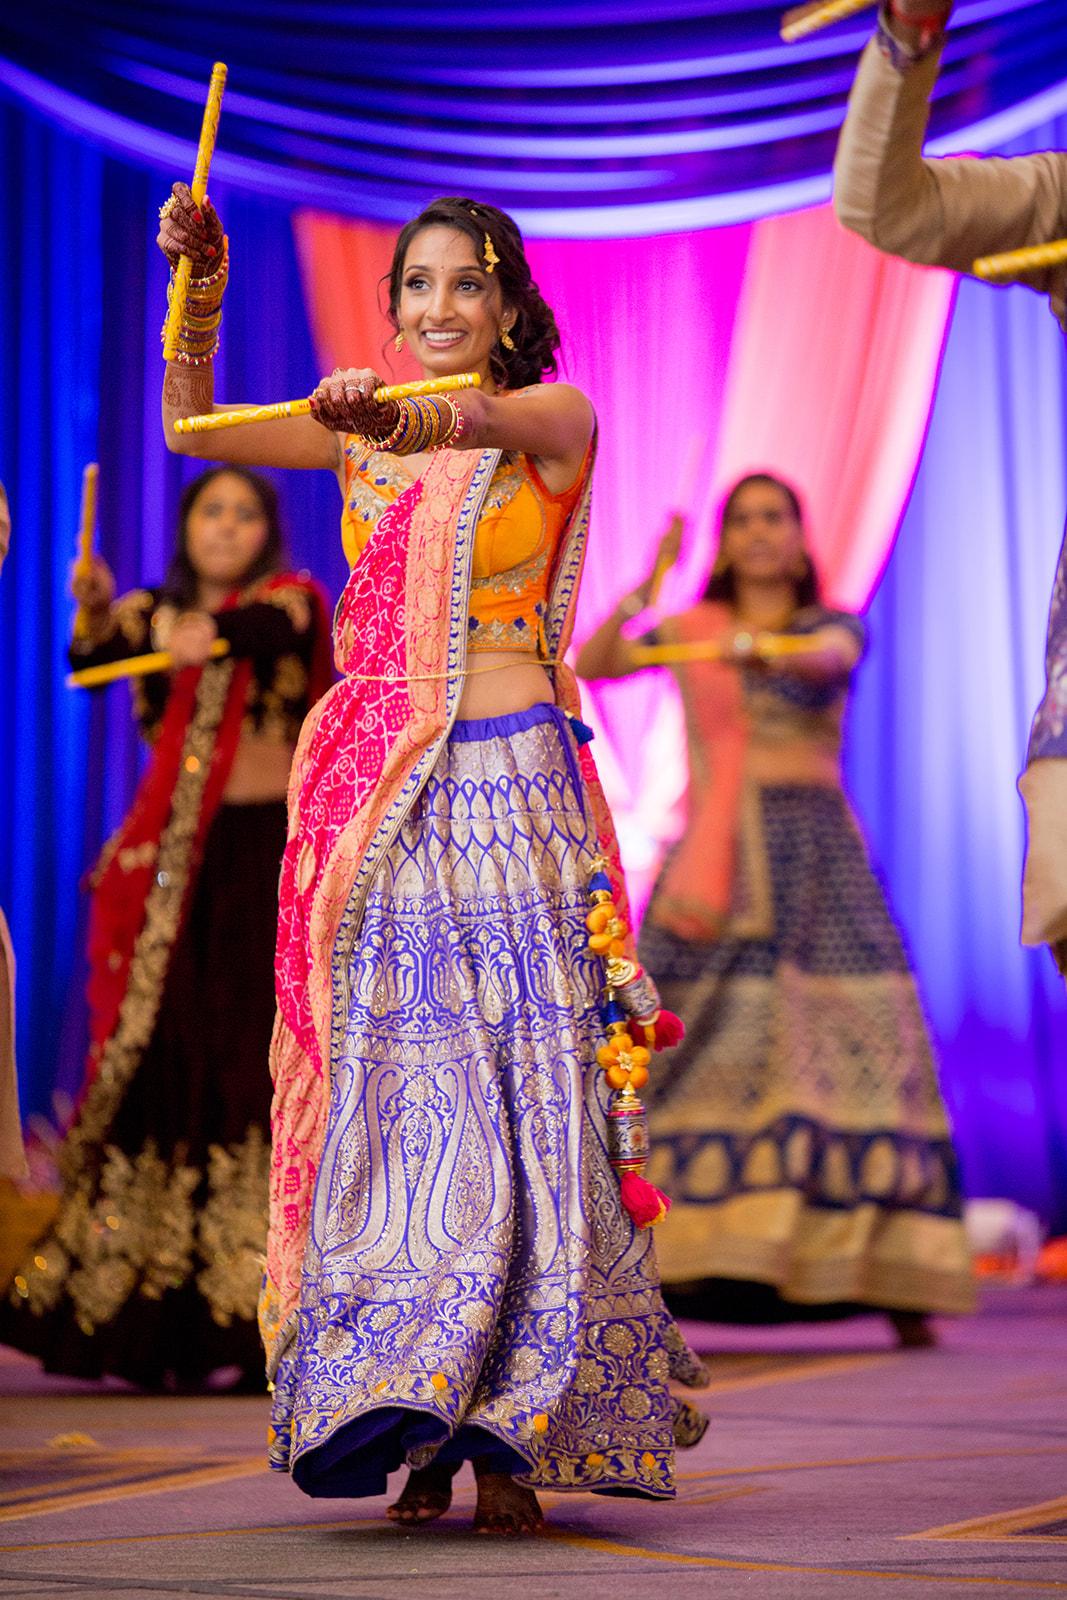 Le Cape Weddings - Monica and Pratik - Sangeet 00453.jpg